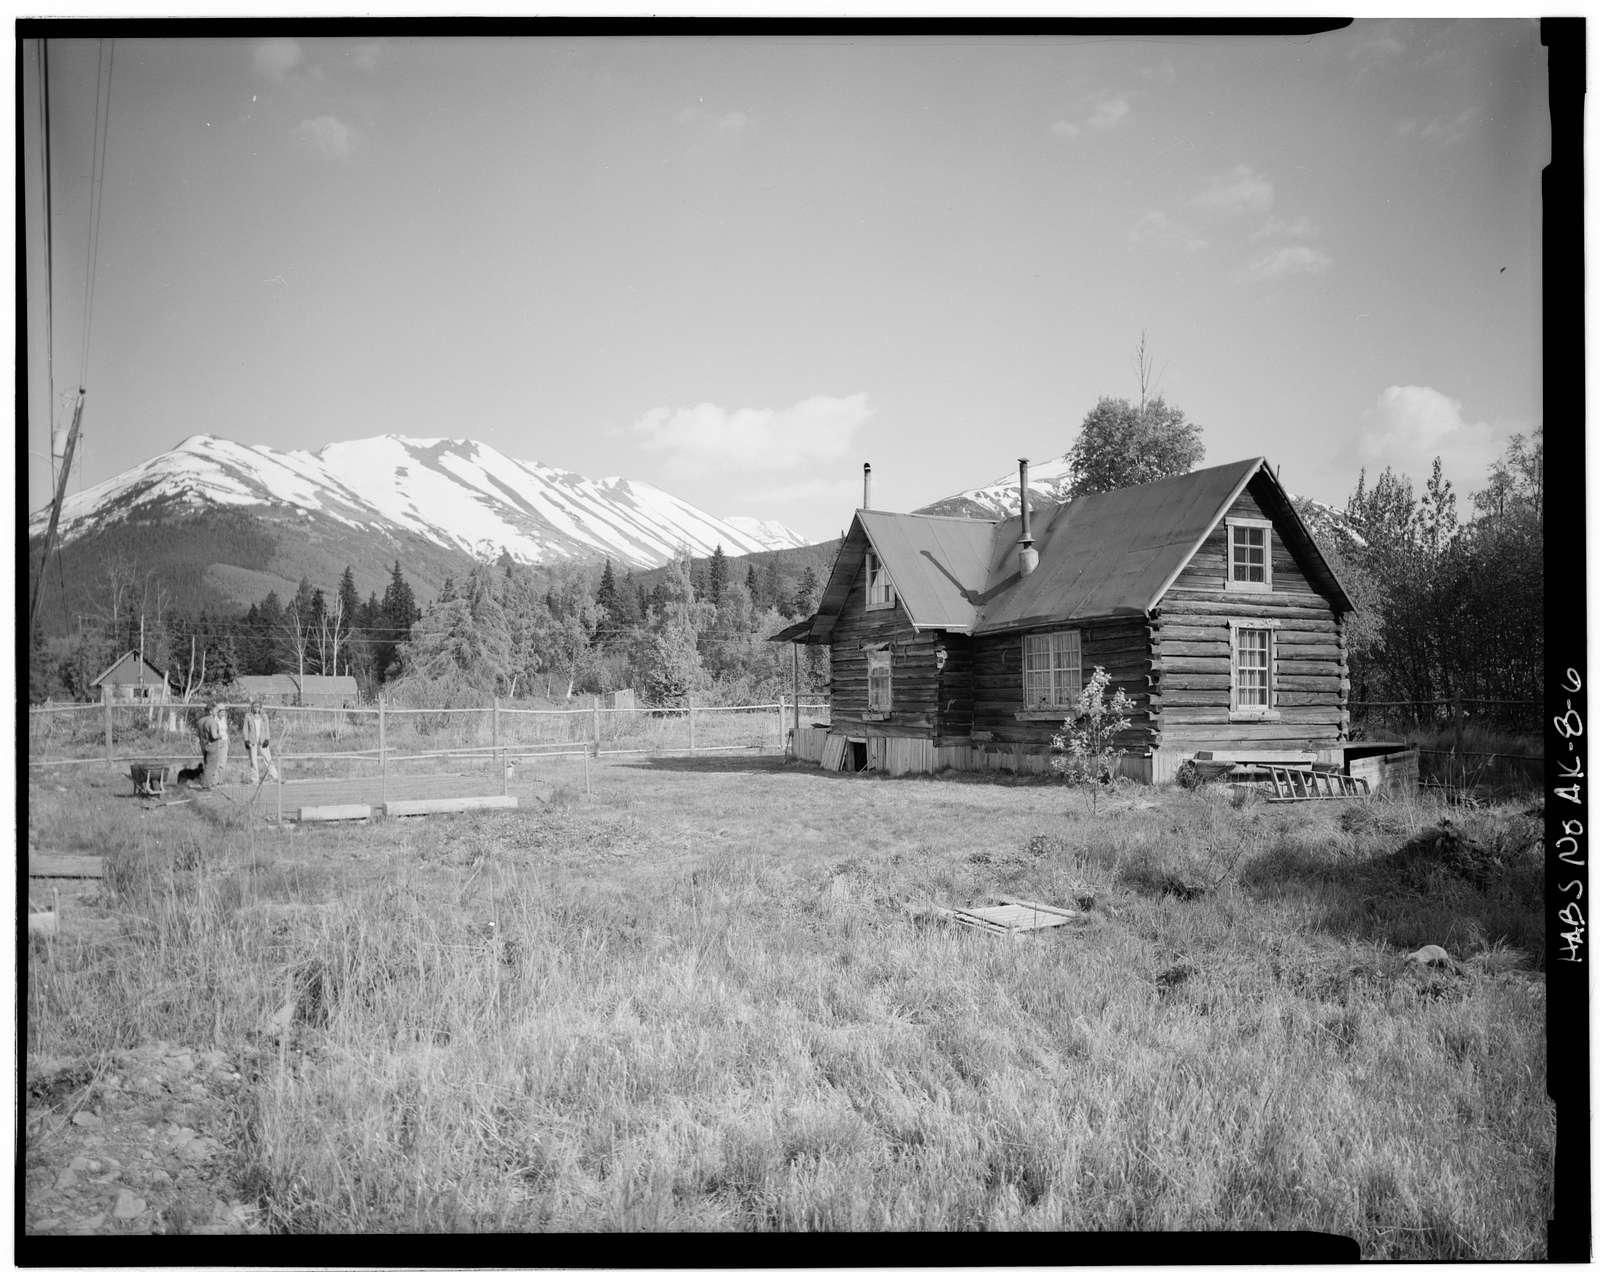 Village of Hope, Hope, Kenai Peninsula Borough, AK